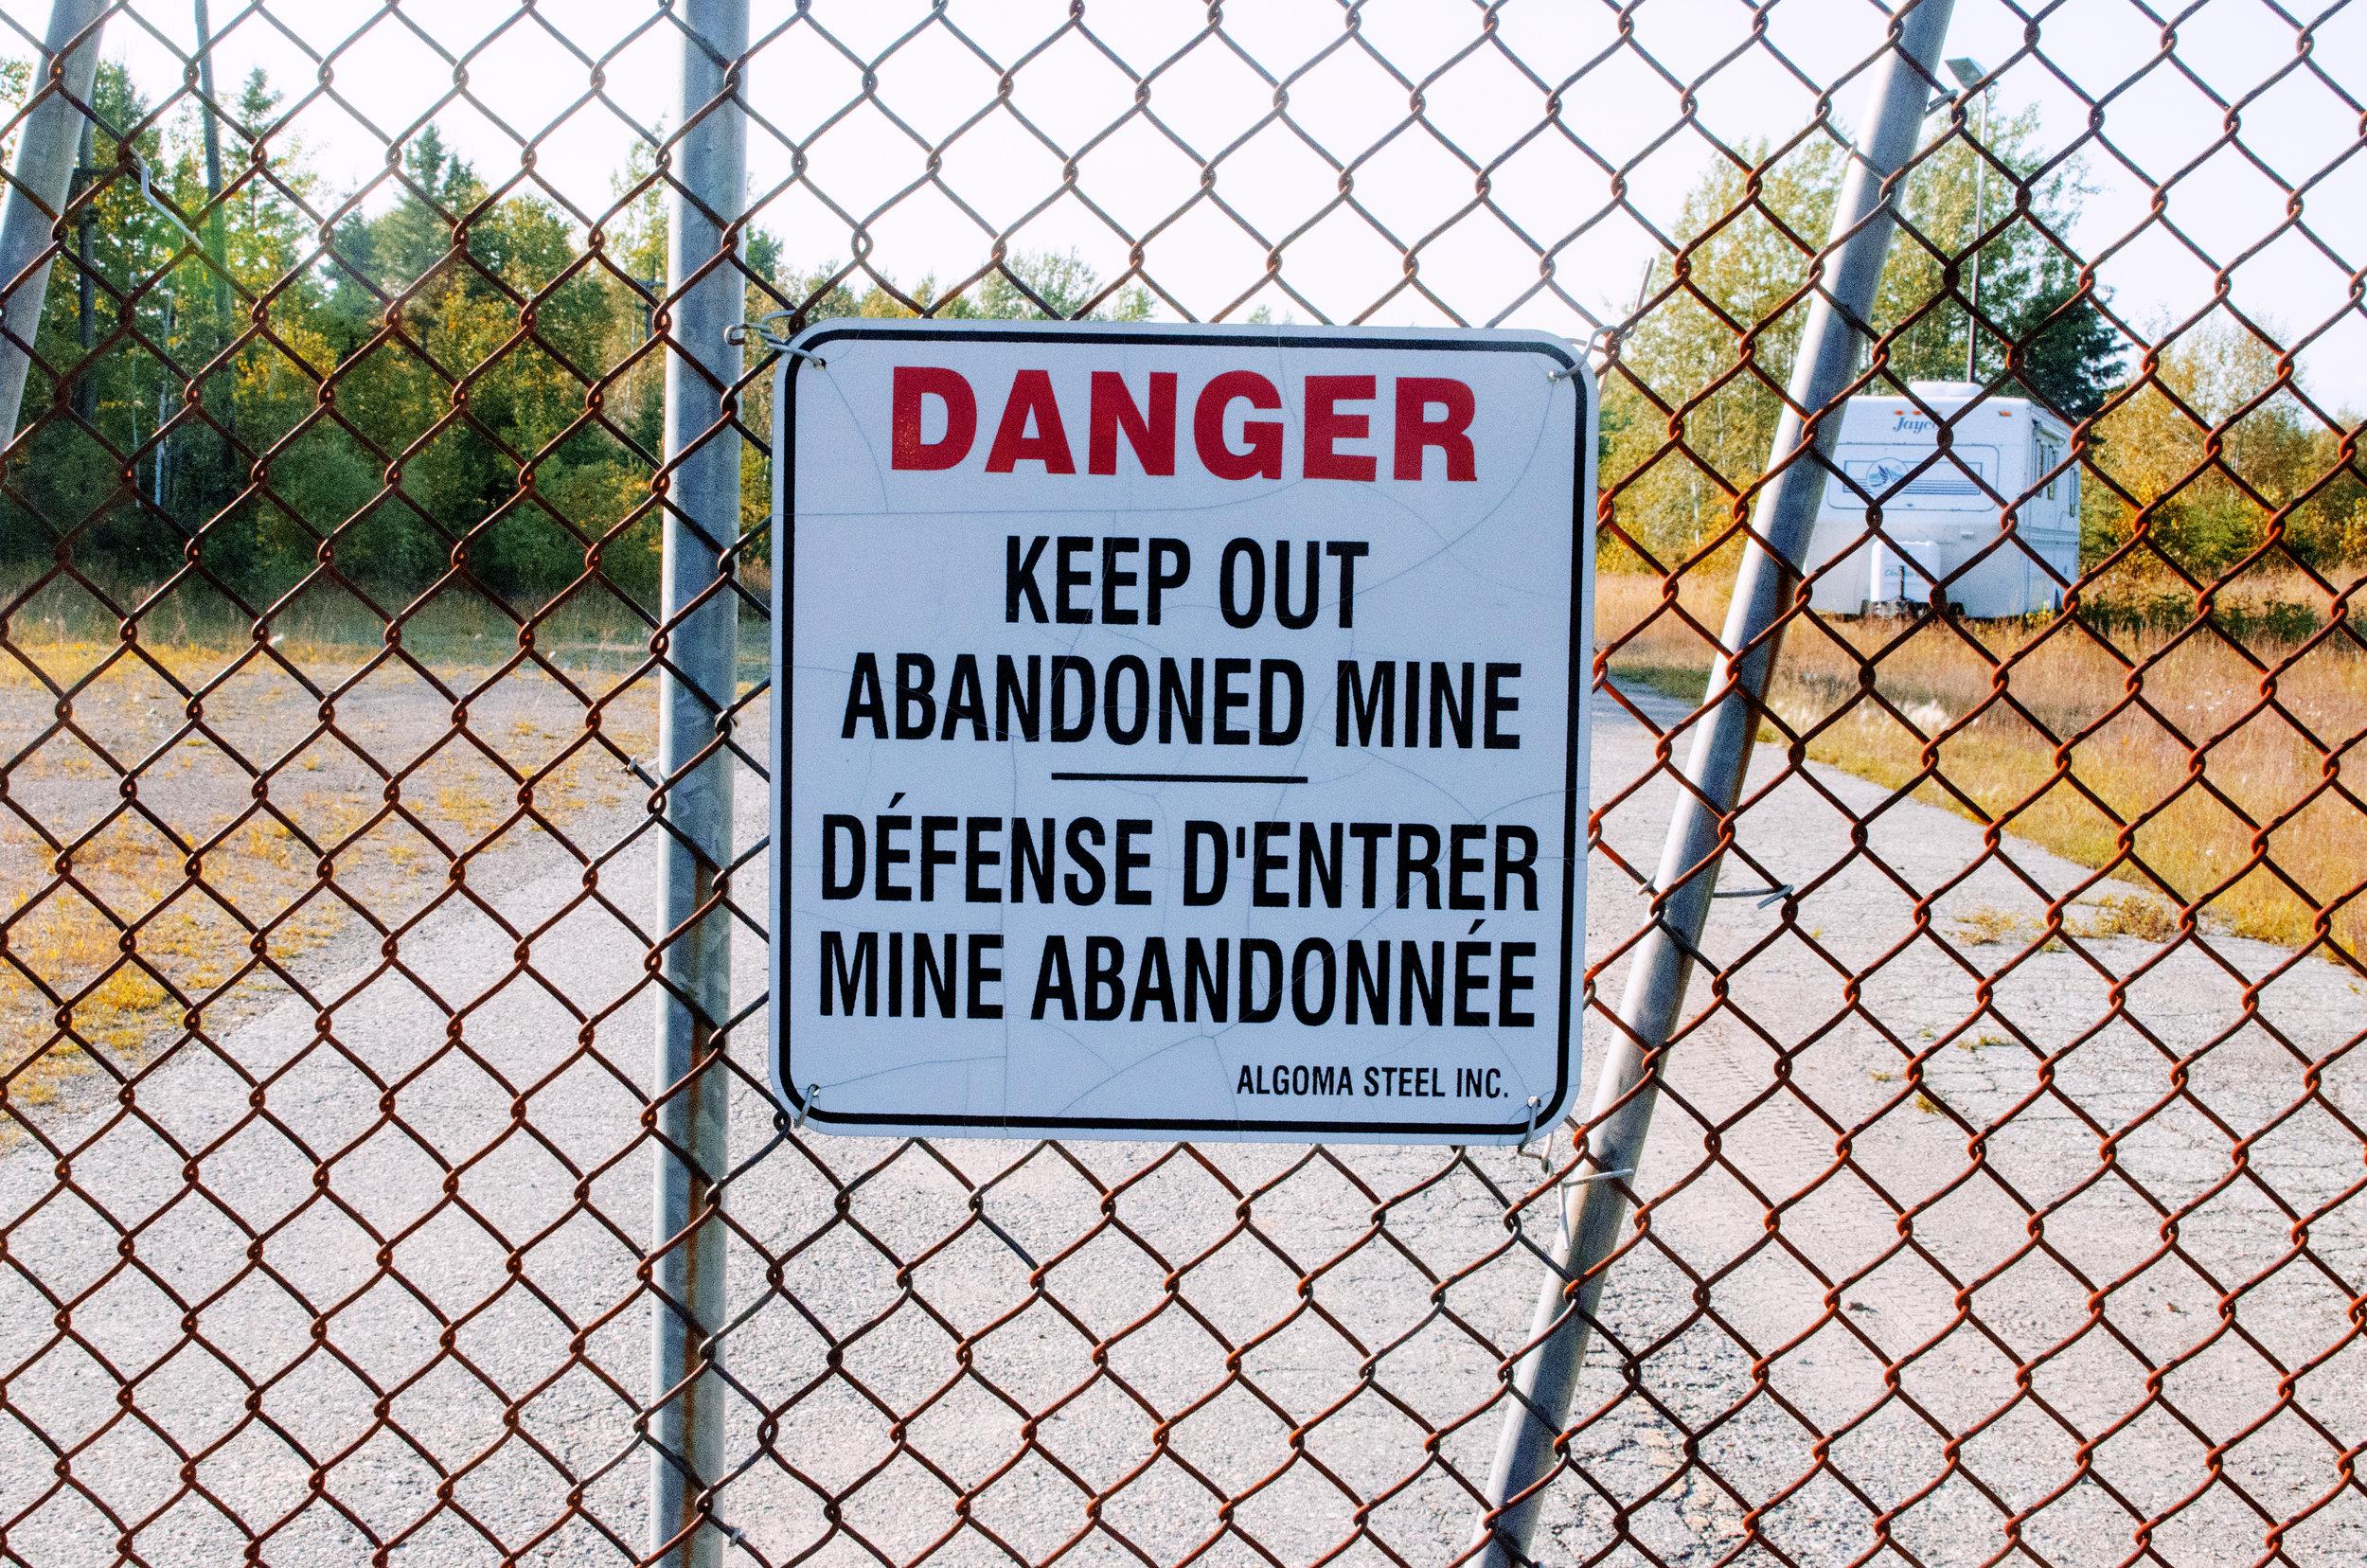 Jenkins, Cheyenne. Abandoned Mine. 2017. Digital Photography. Wawa, Ontario